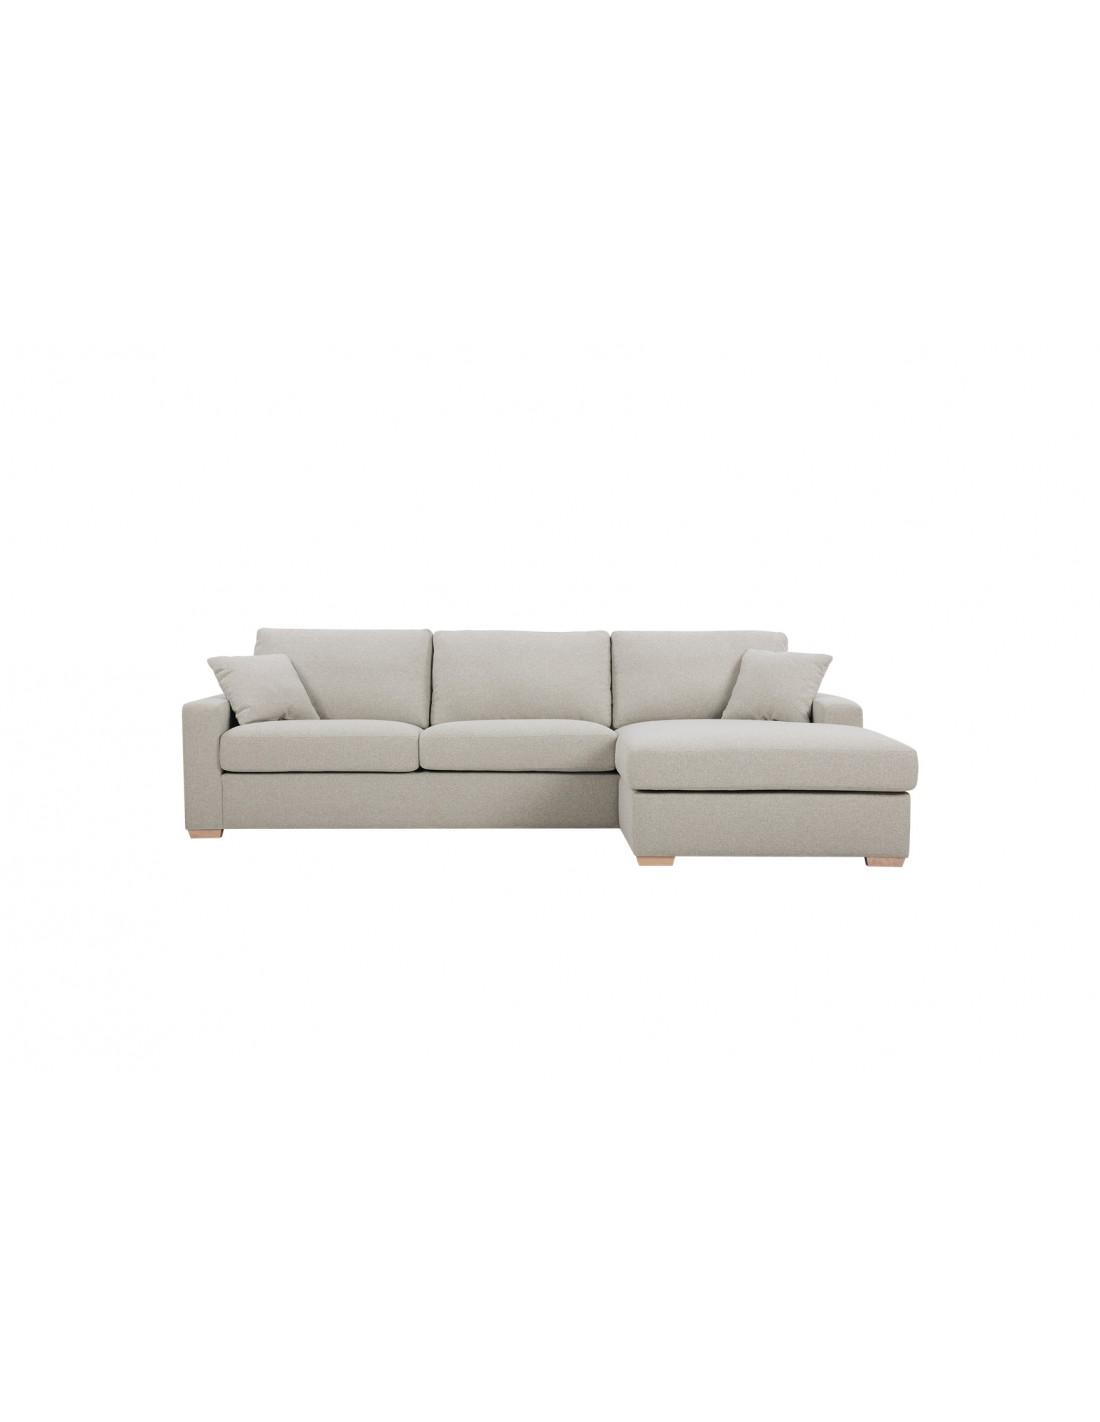 PHOENIX sofa set